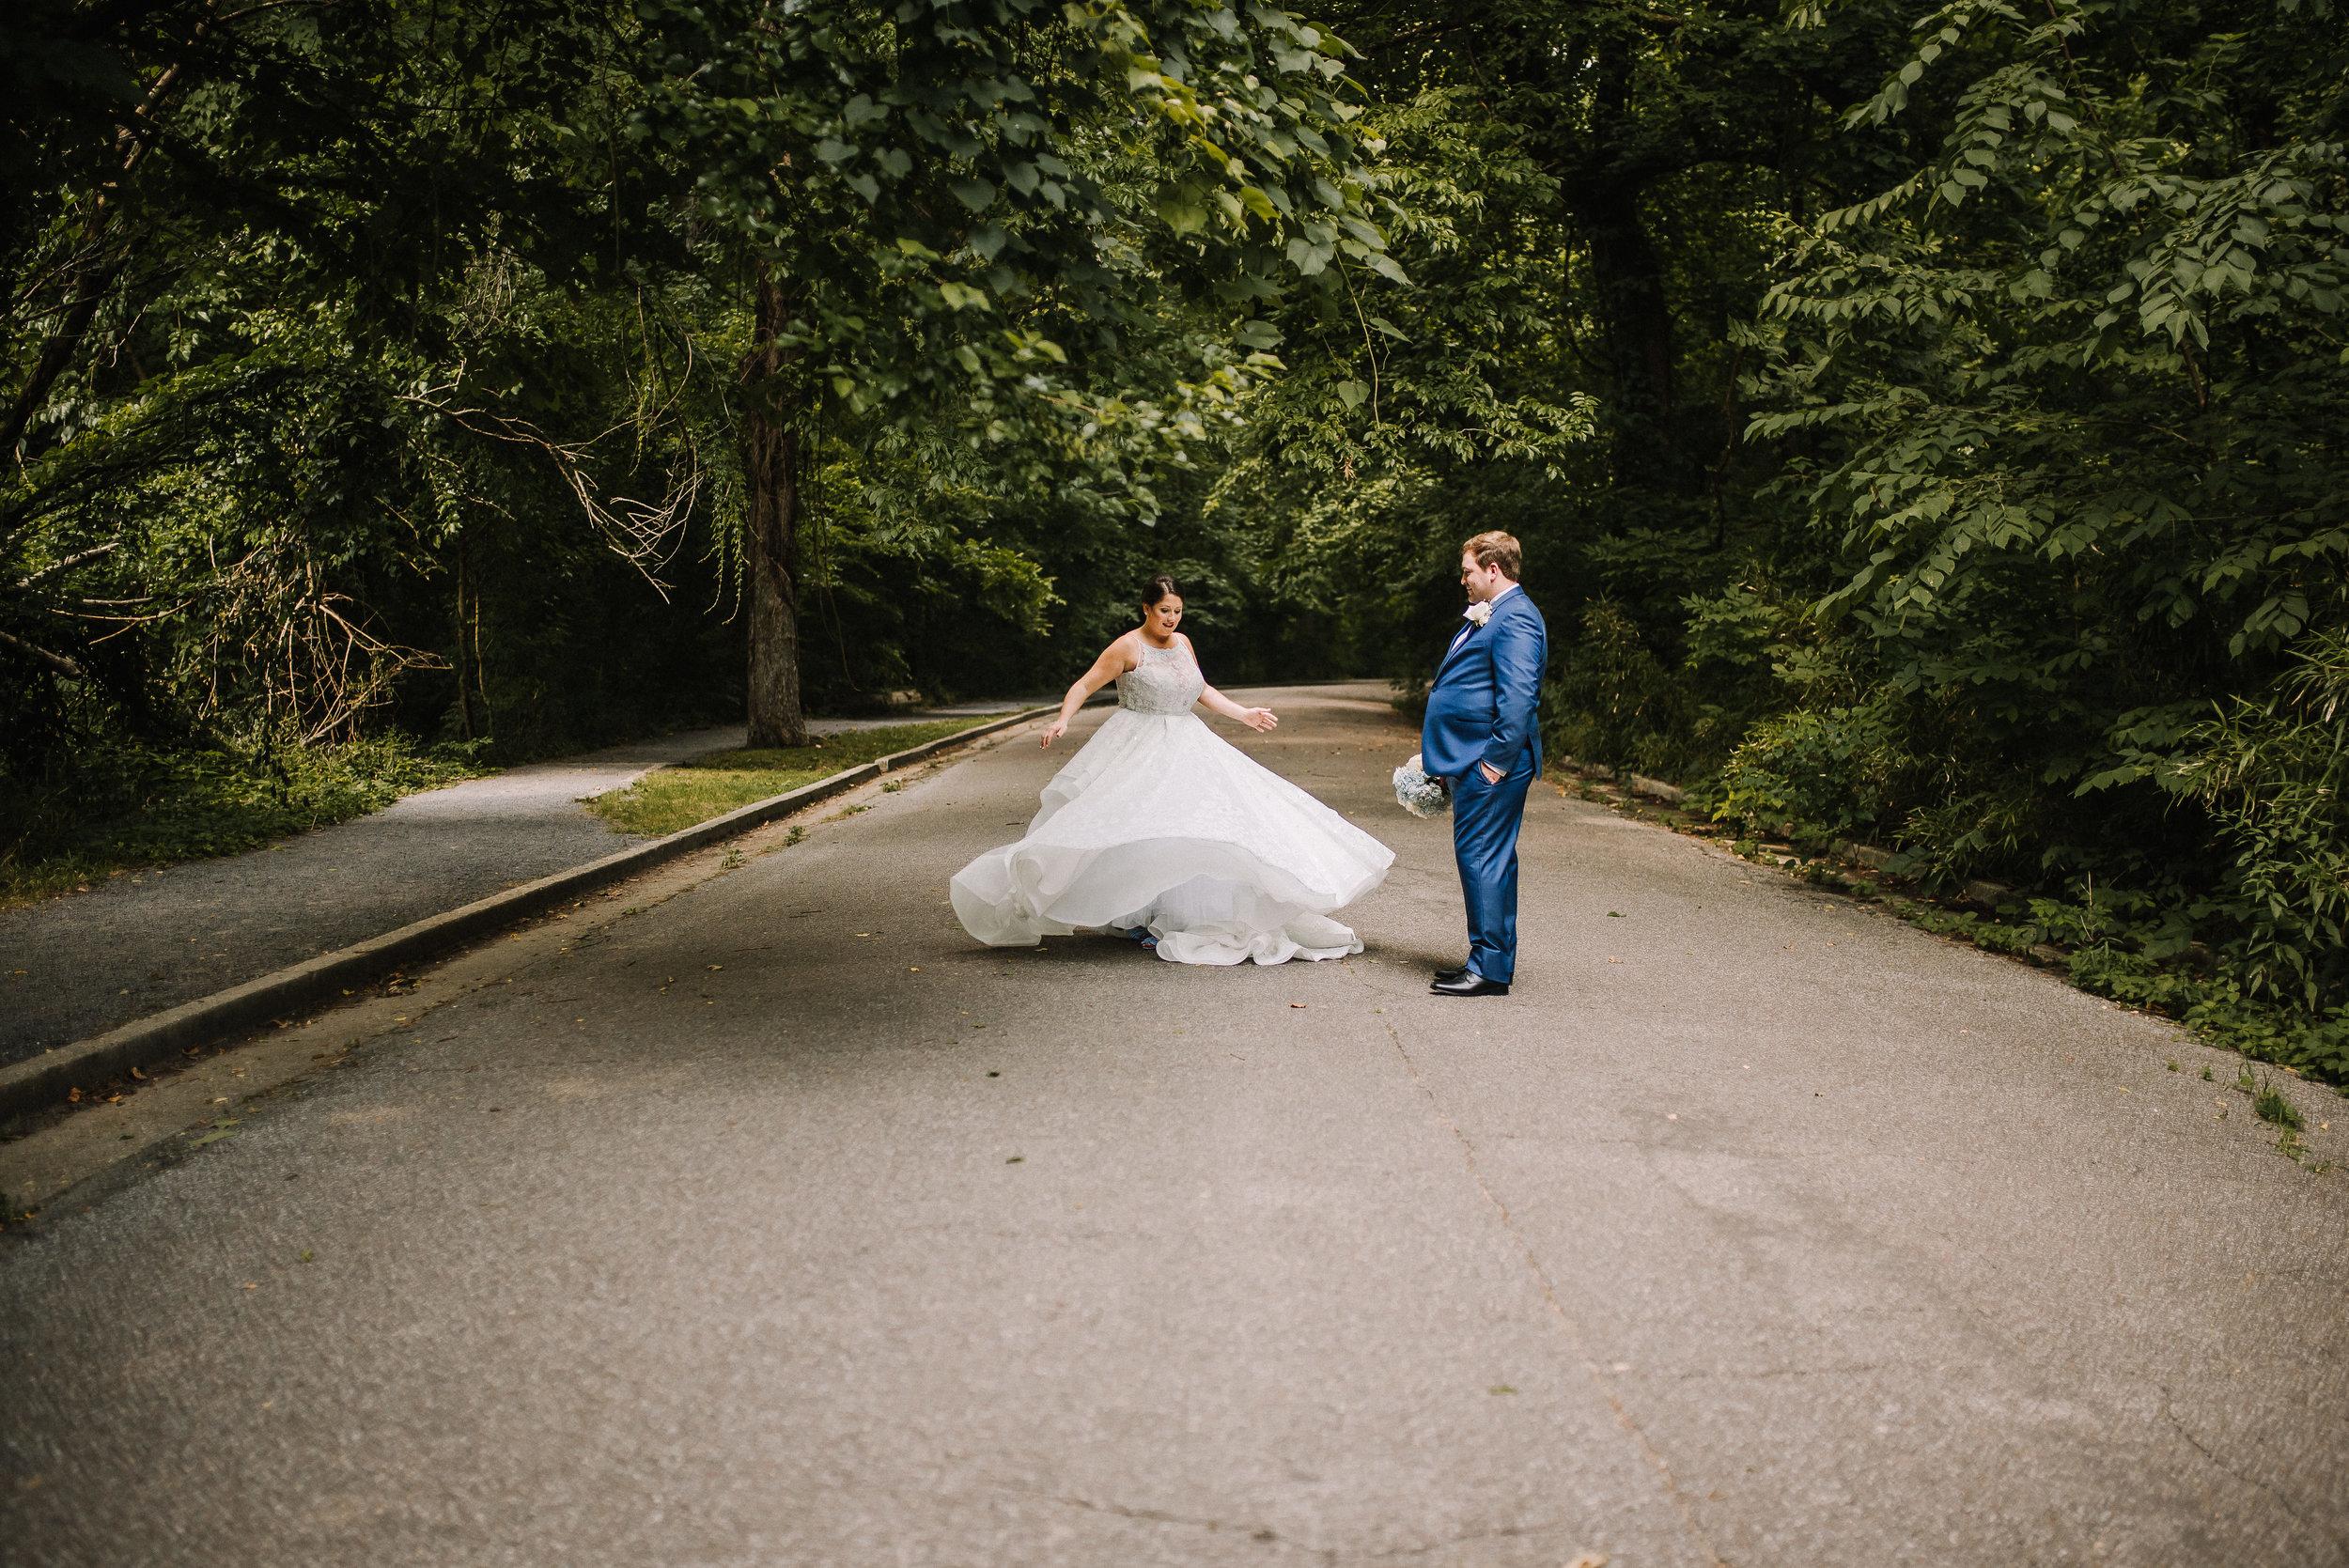 Smith Wedding_Memphis Zoo_Ashley Benham Photography-236.jpg